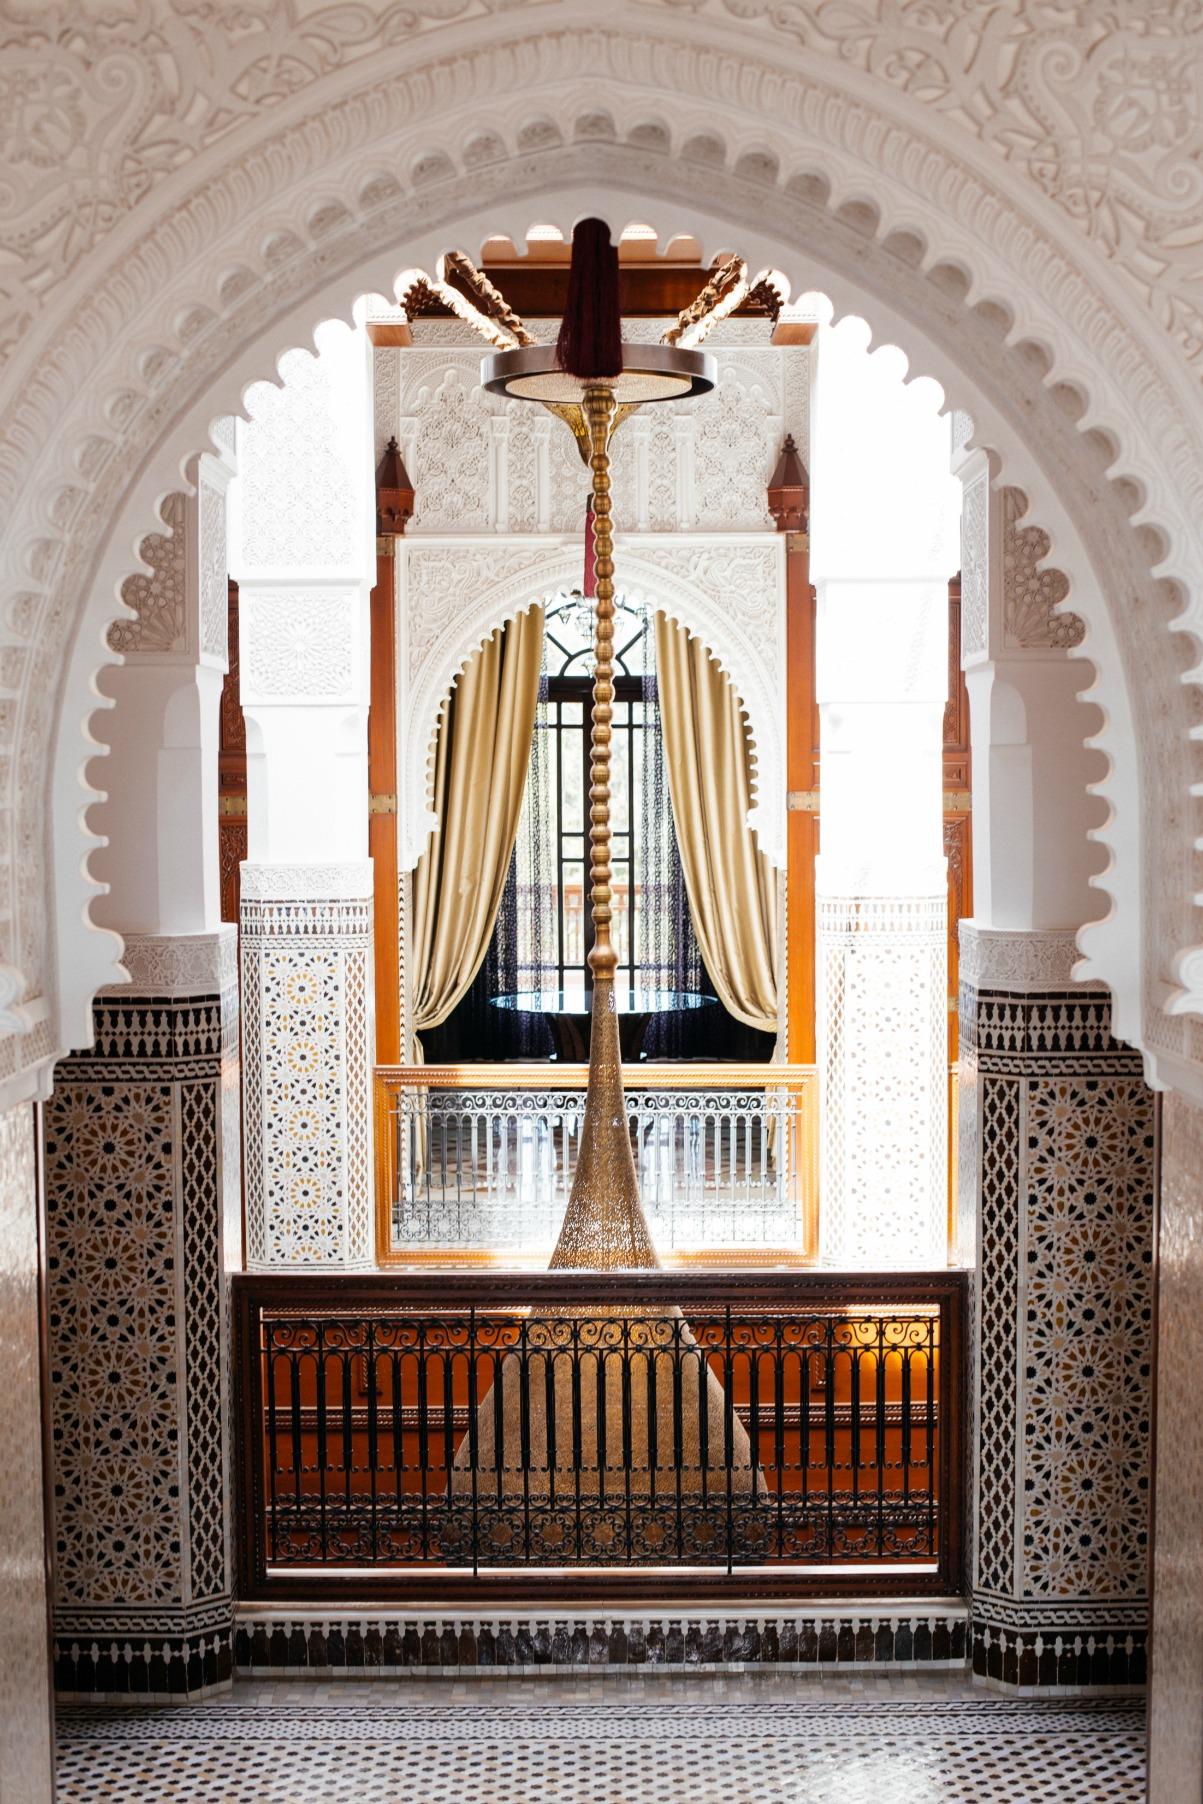 royal-mansour-hotel-luxury-marrakesch-marrakesh-morocco-edisa-shahini-disicouture-blog-66